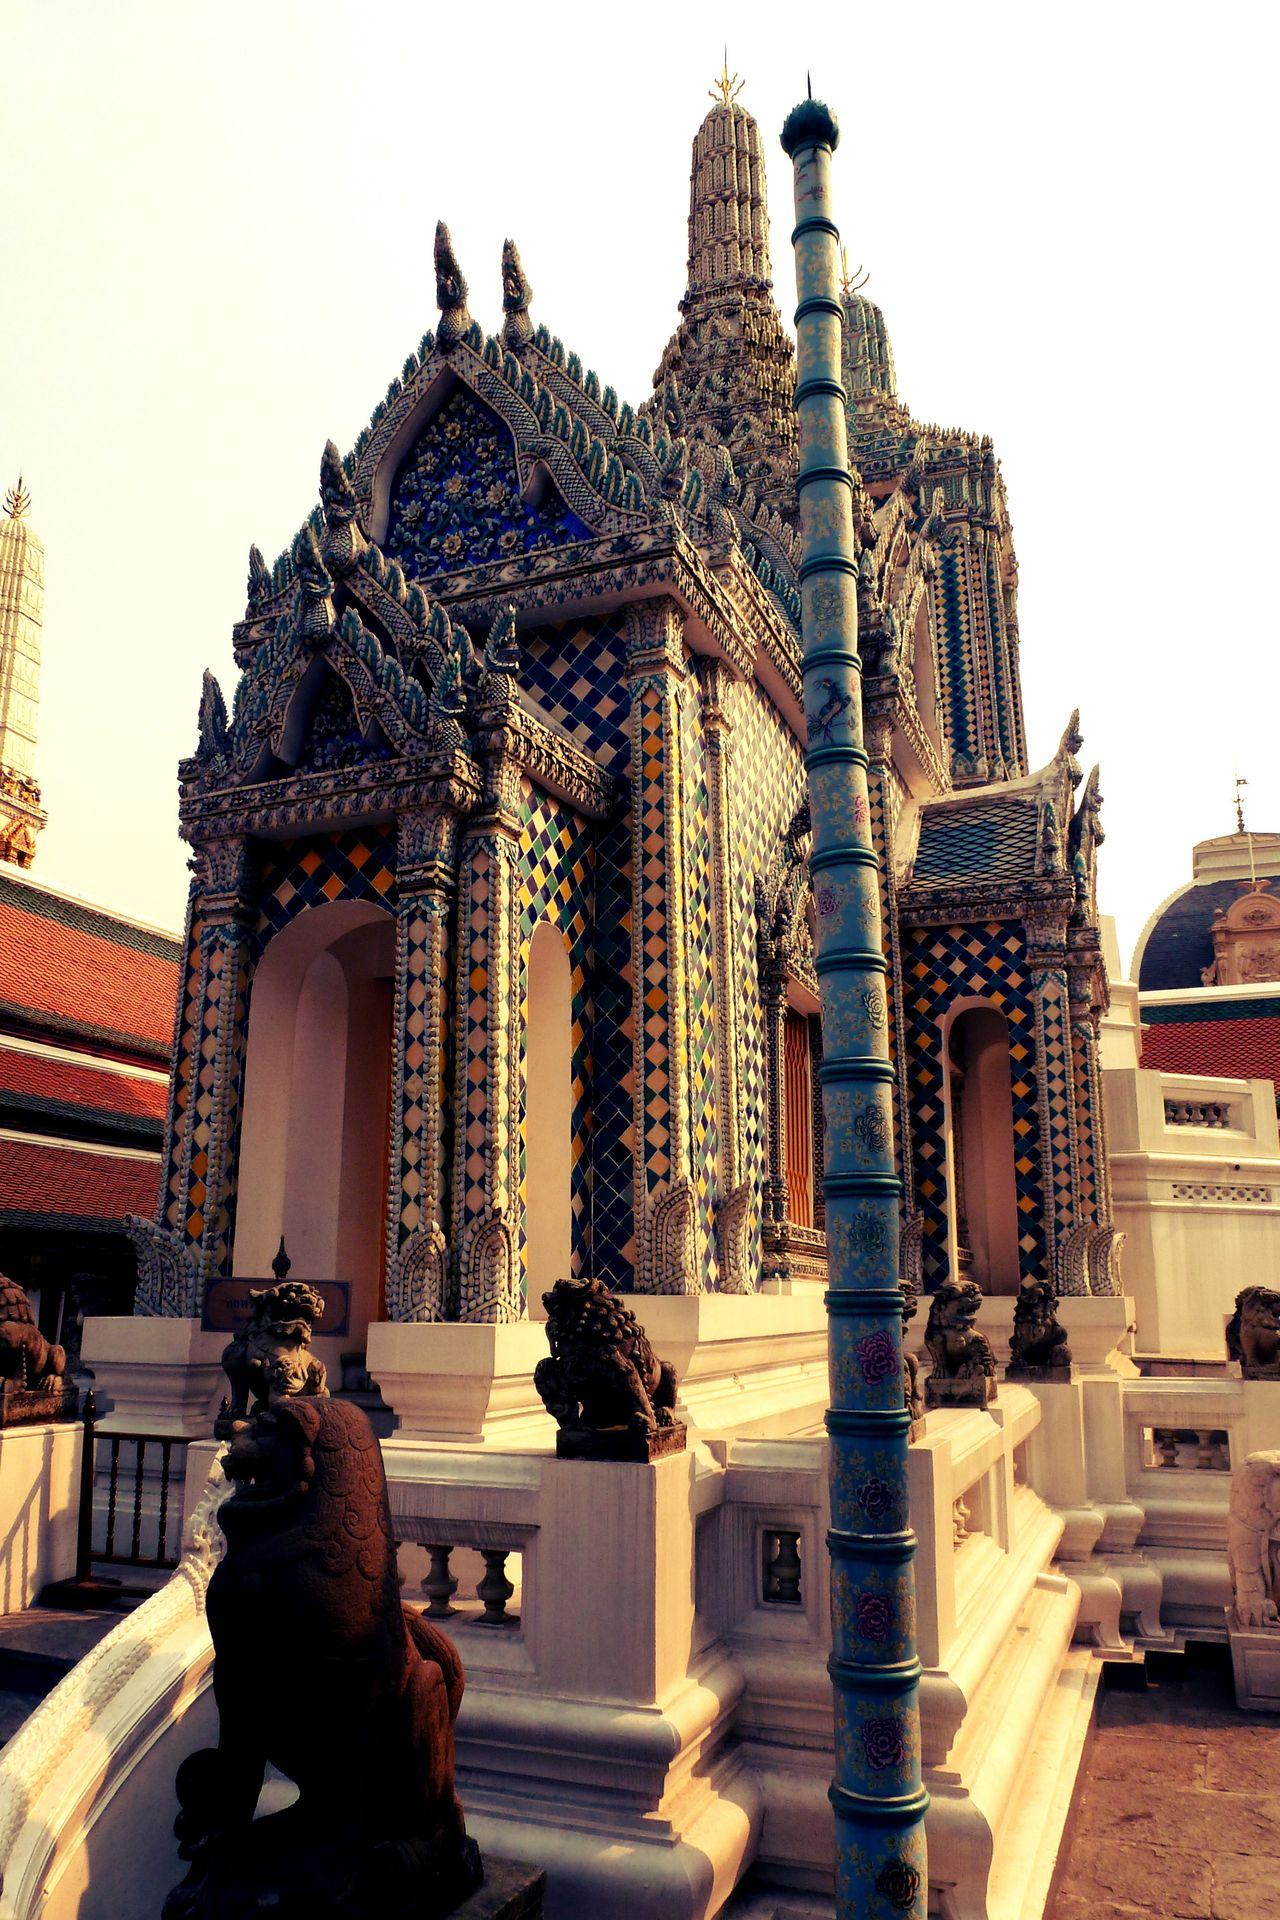 Architecture Bangkok Detailed Art EyeEm City Shots Great Palace Bang Great Palace Bangkok No People Palace Bangkok Thailand Place Of Worship Splendid Thailand Tourist Spot Travel Destinations